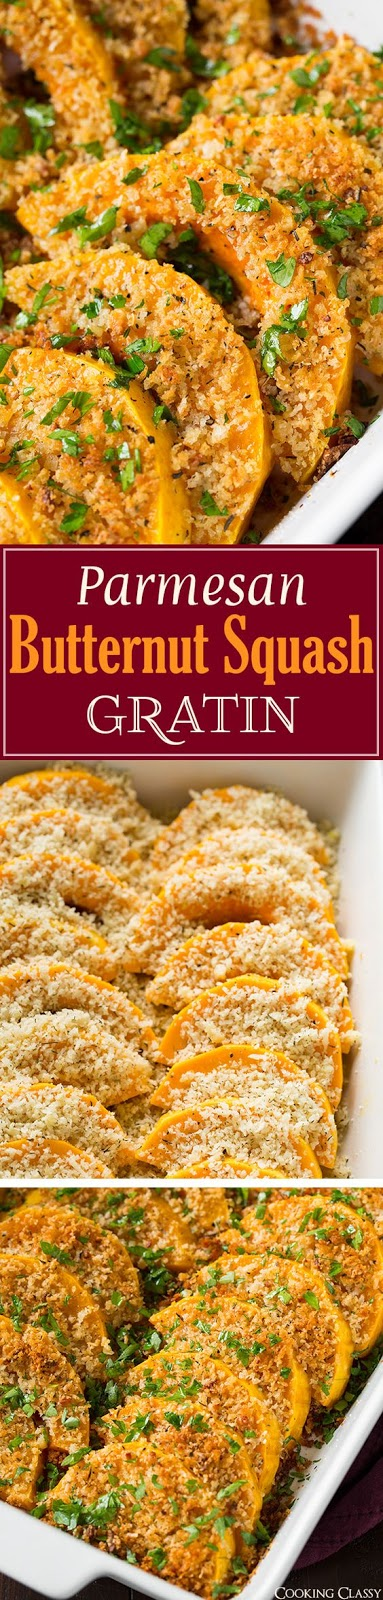 Parmesan Butternut Squash Gratin